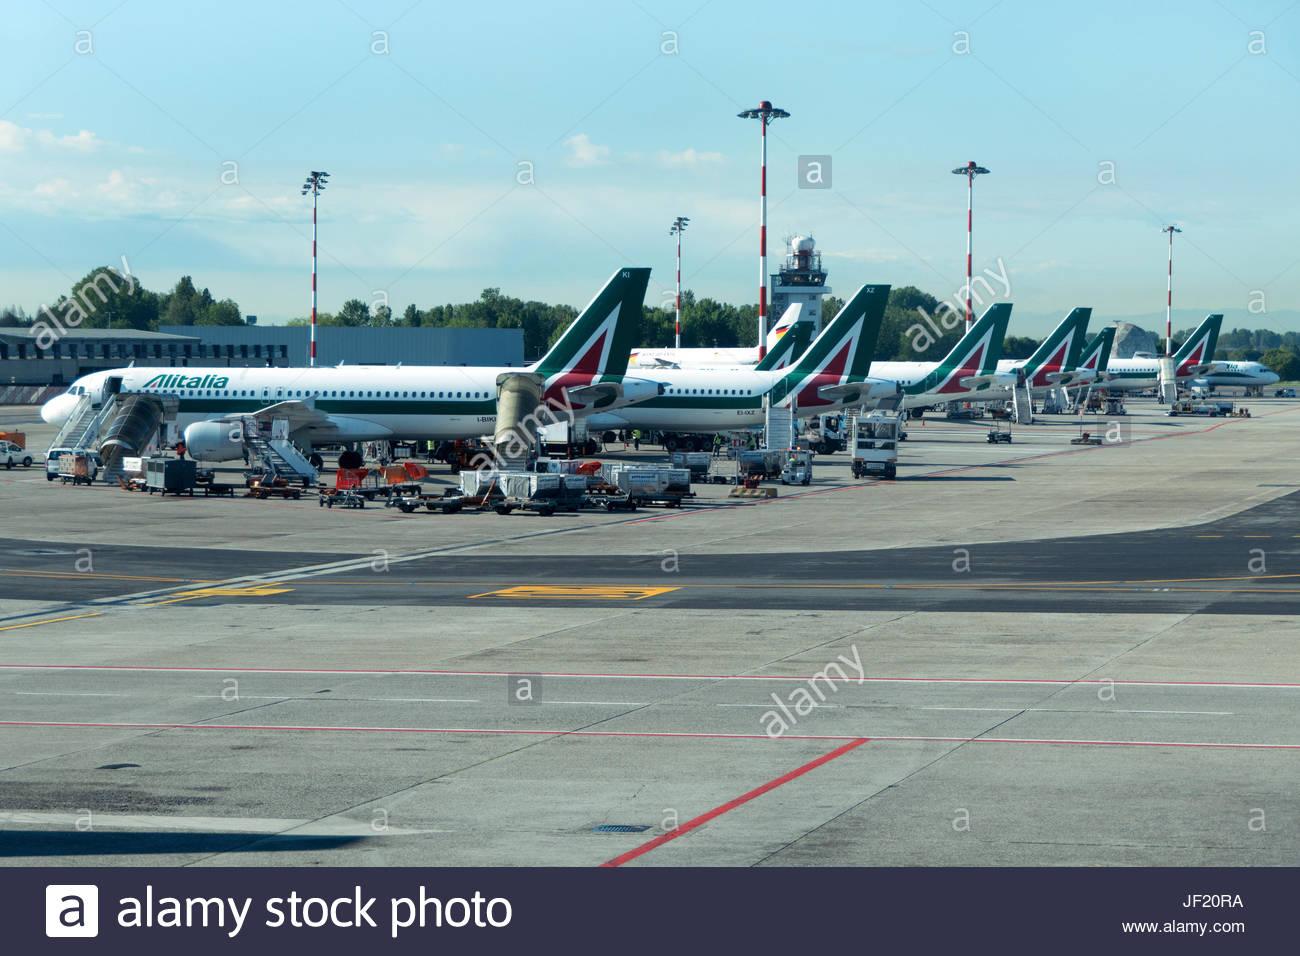 Linate International City Airport, Milan, Alitalia airplanes - Stock Image